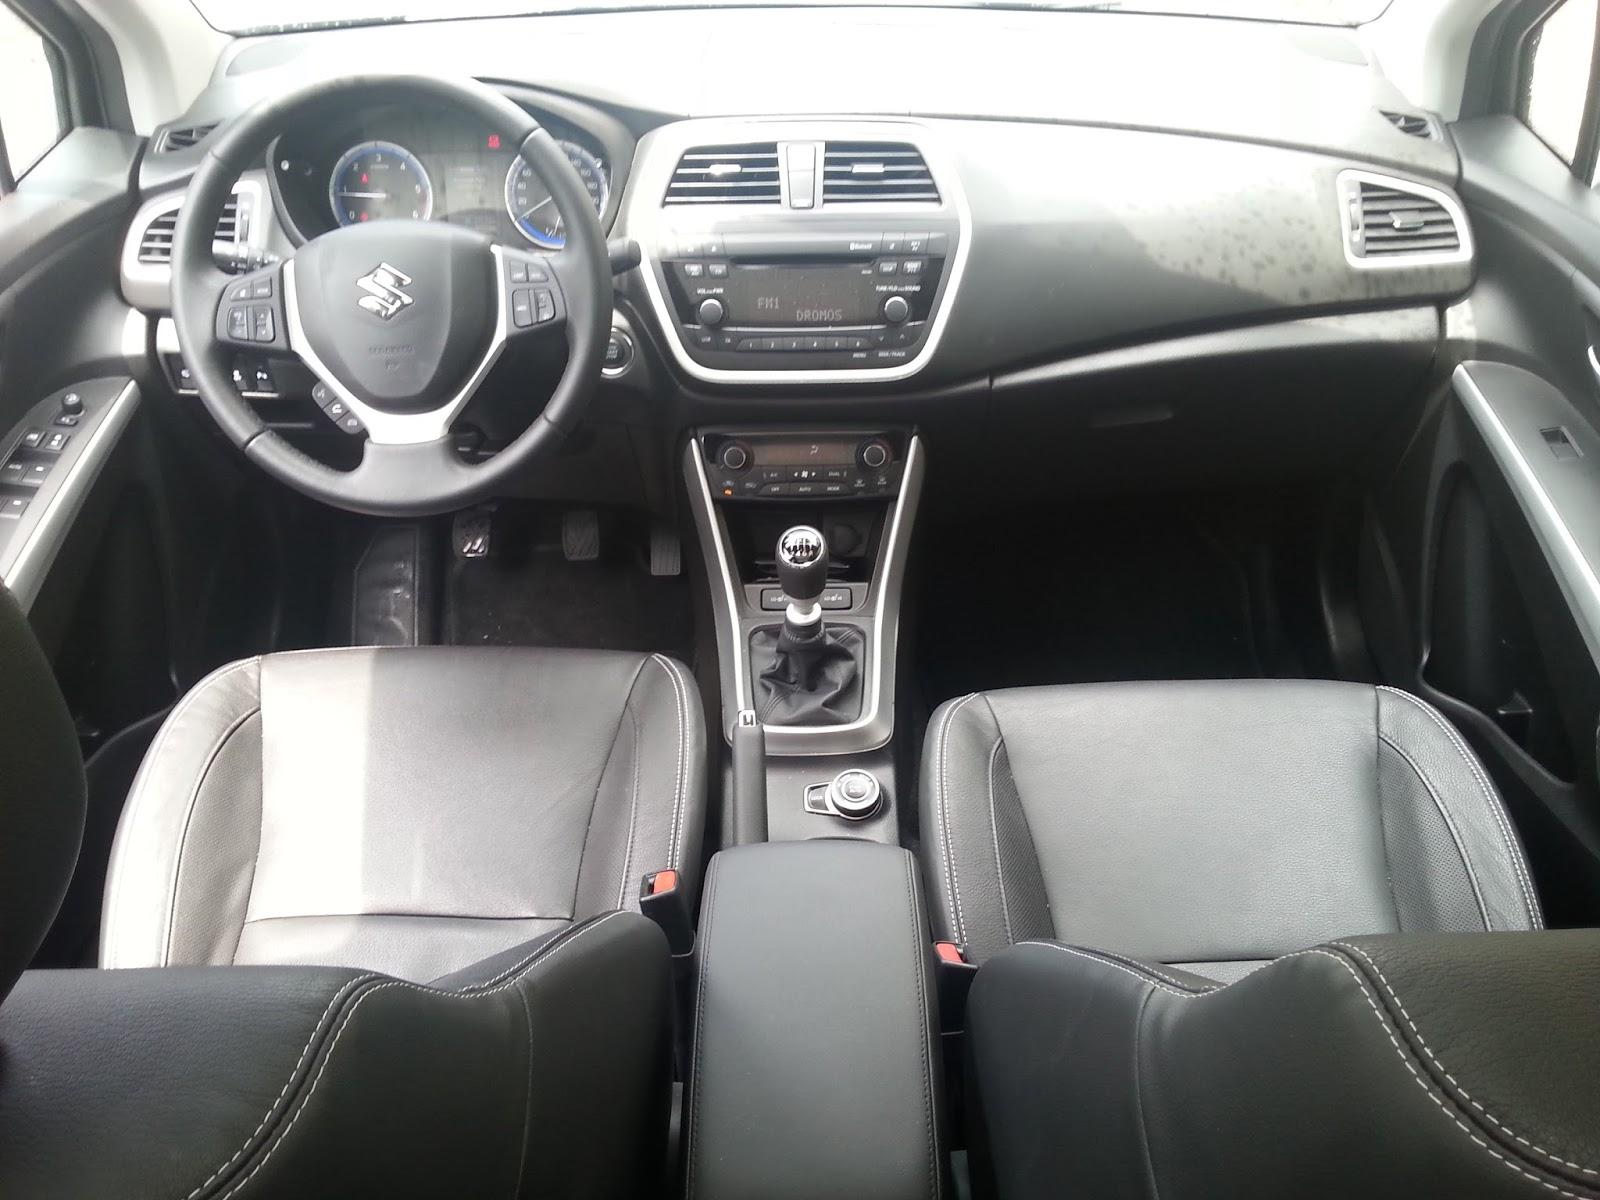 f3 Οδηγούμε το Suzuki SX4-S-Cross 1,6 diesel 4X4 Suzuki, Suzuki S-Cross, Suzuki SX4 S-Cross, TEST, ΔΟΚΙΜΕΣ